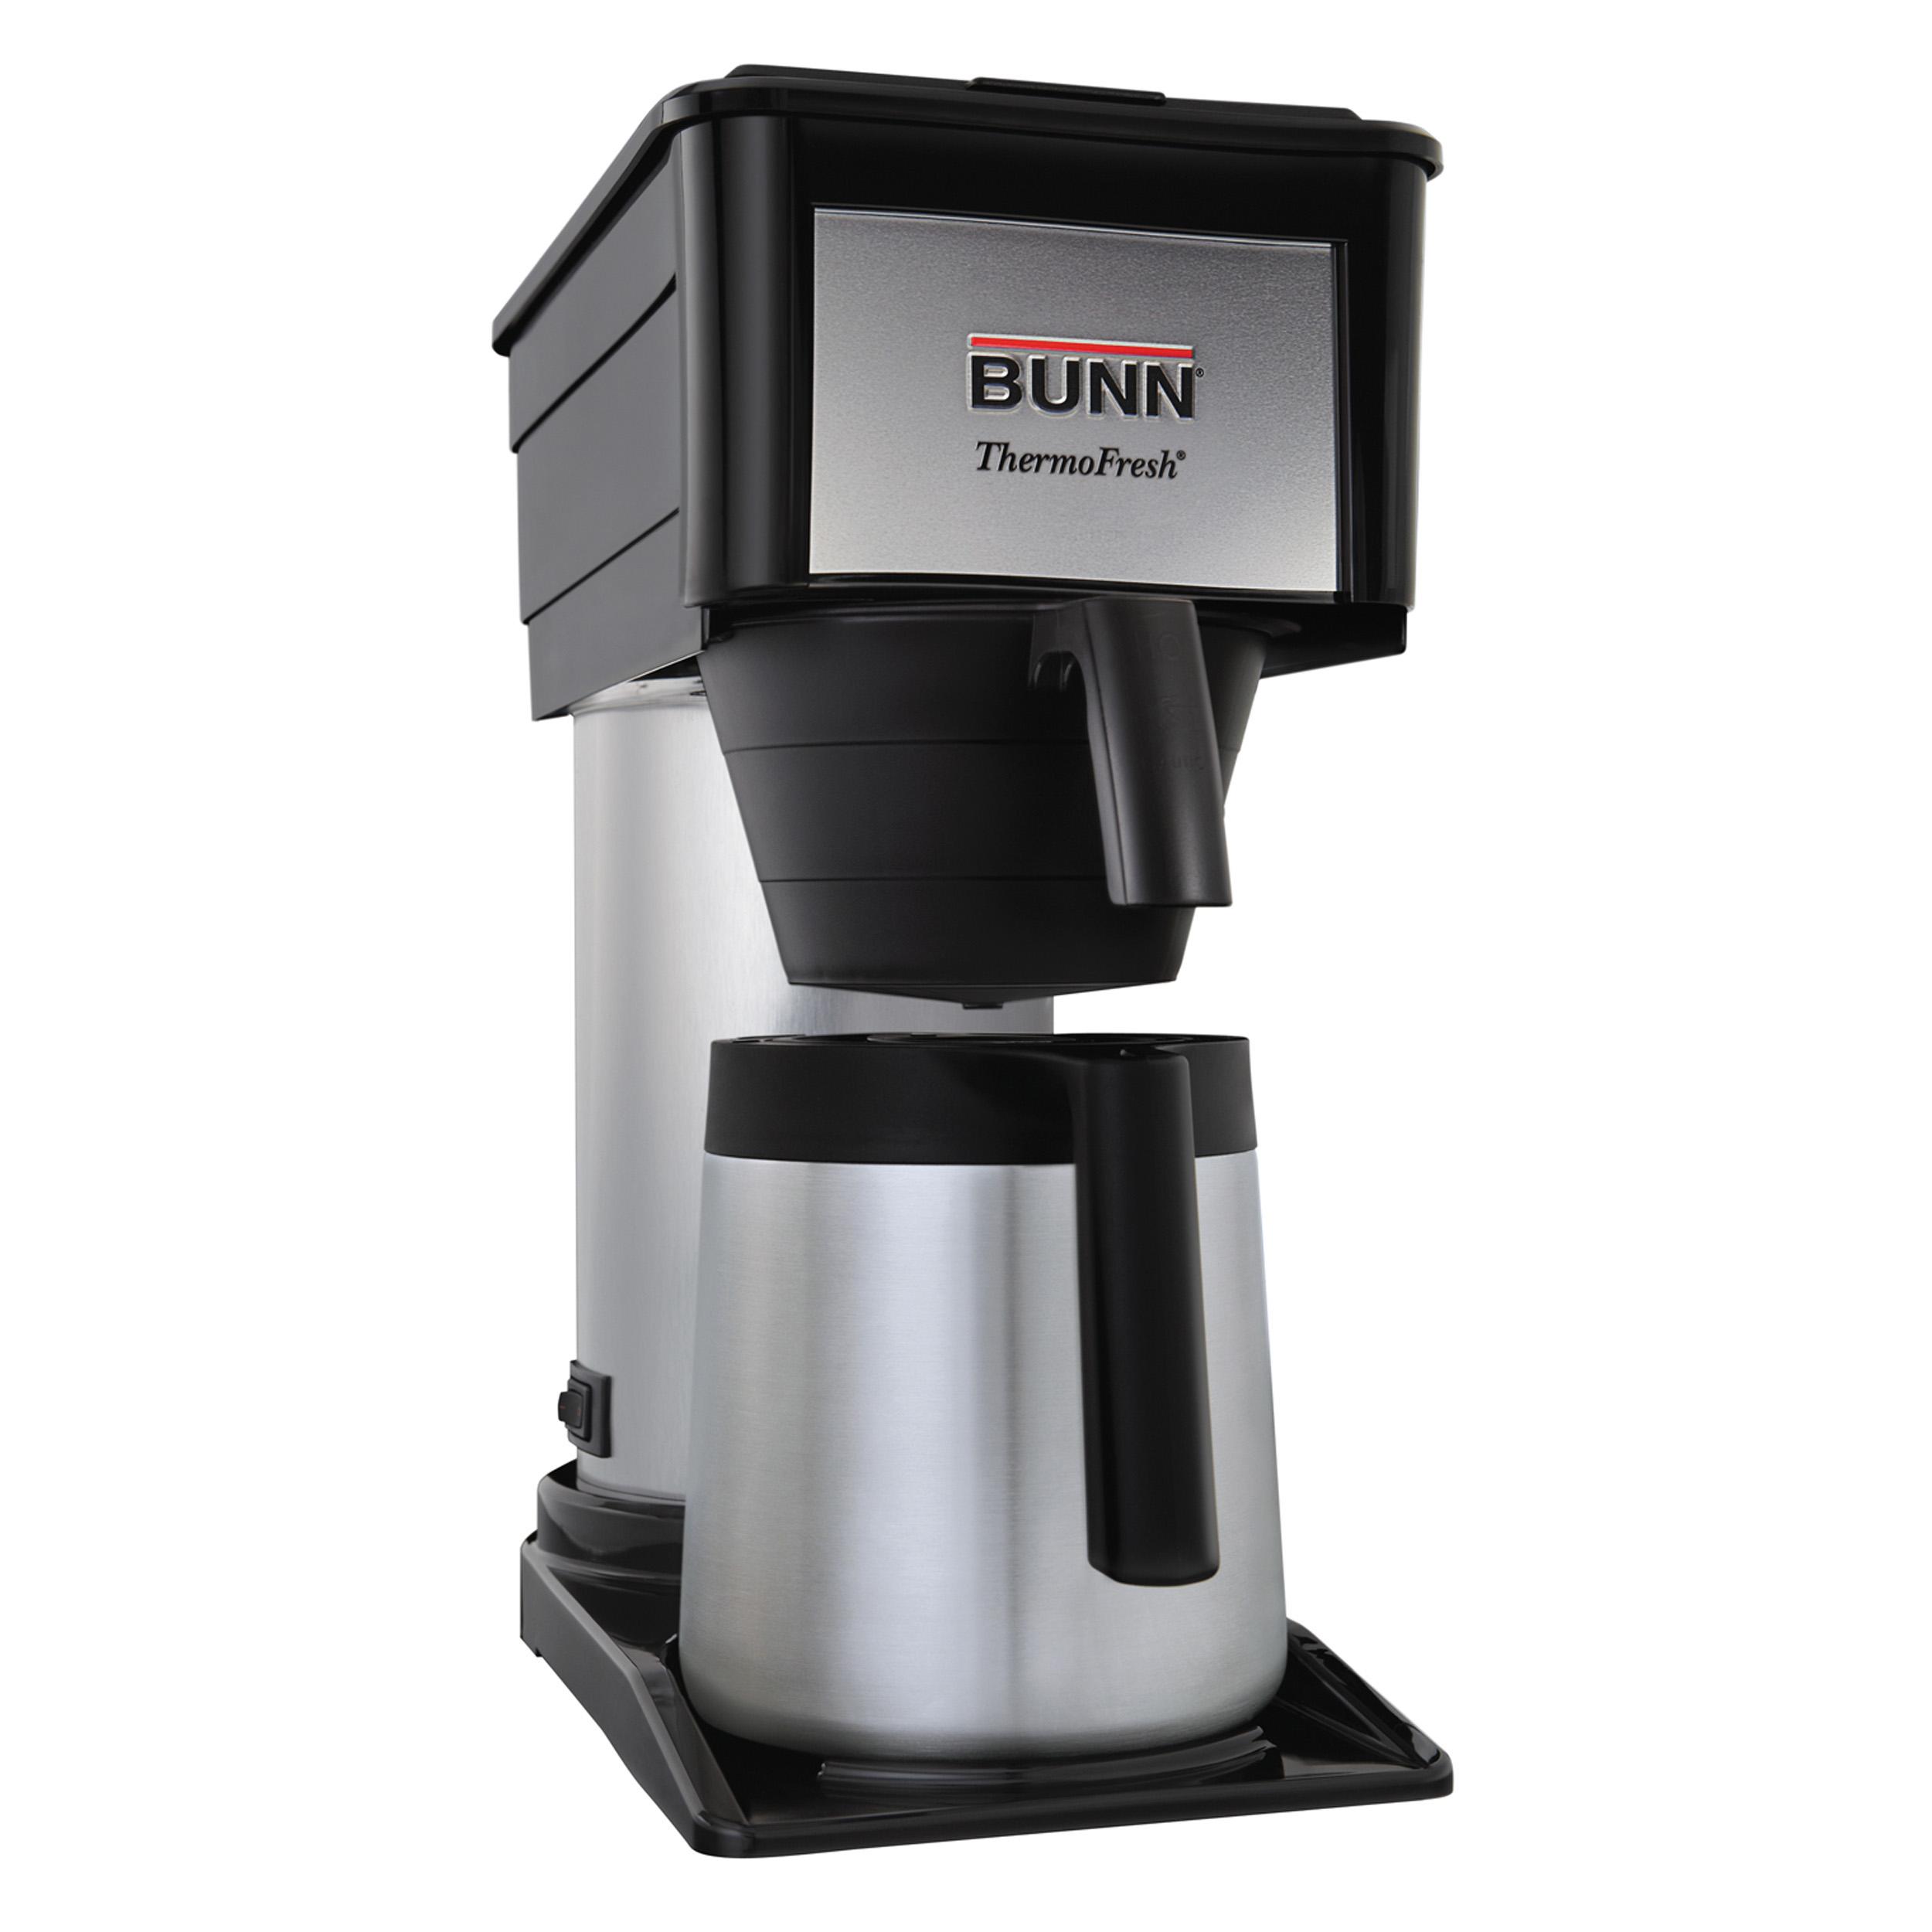 hight resolution of bunn btx b thermofresh 10 cup home thermal carafe coffee brewer blackbunn model bx wiring diagram